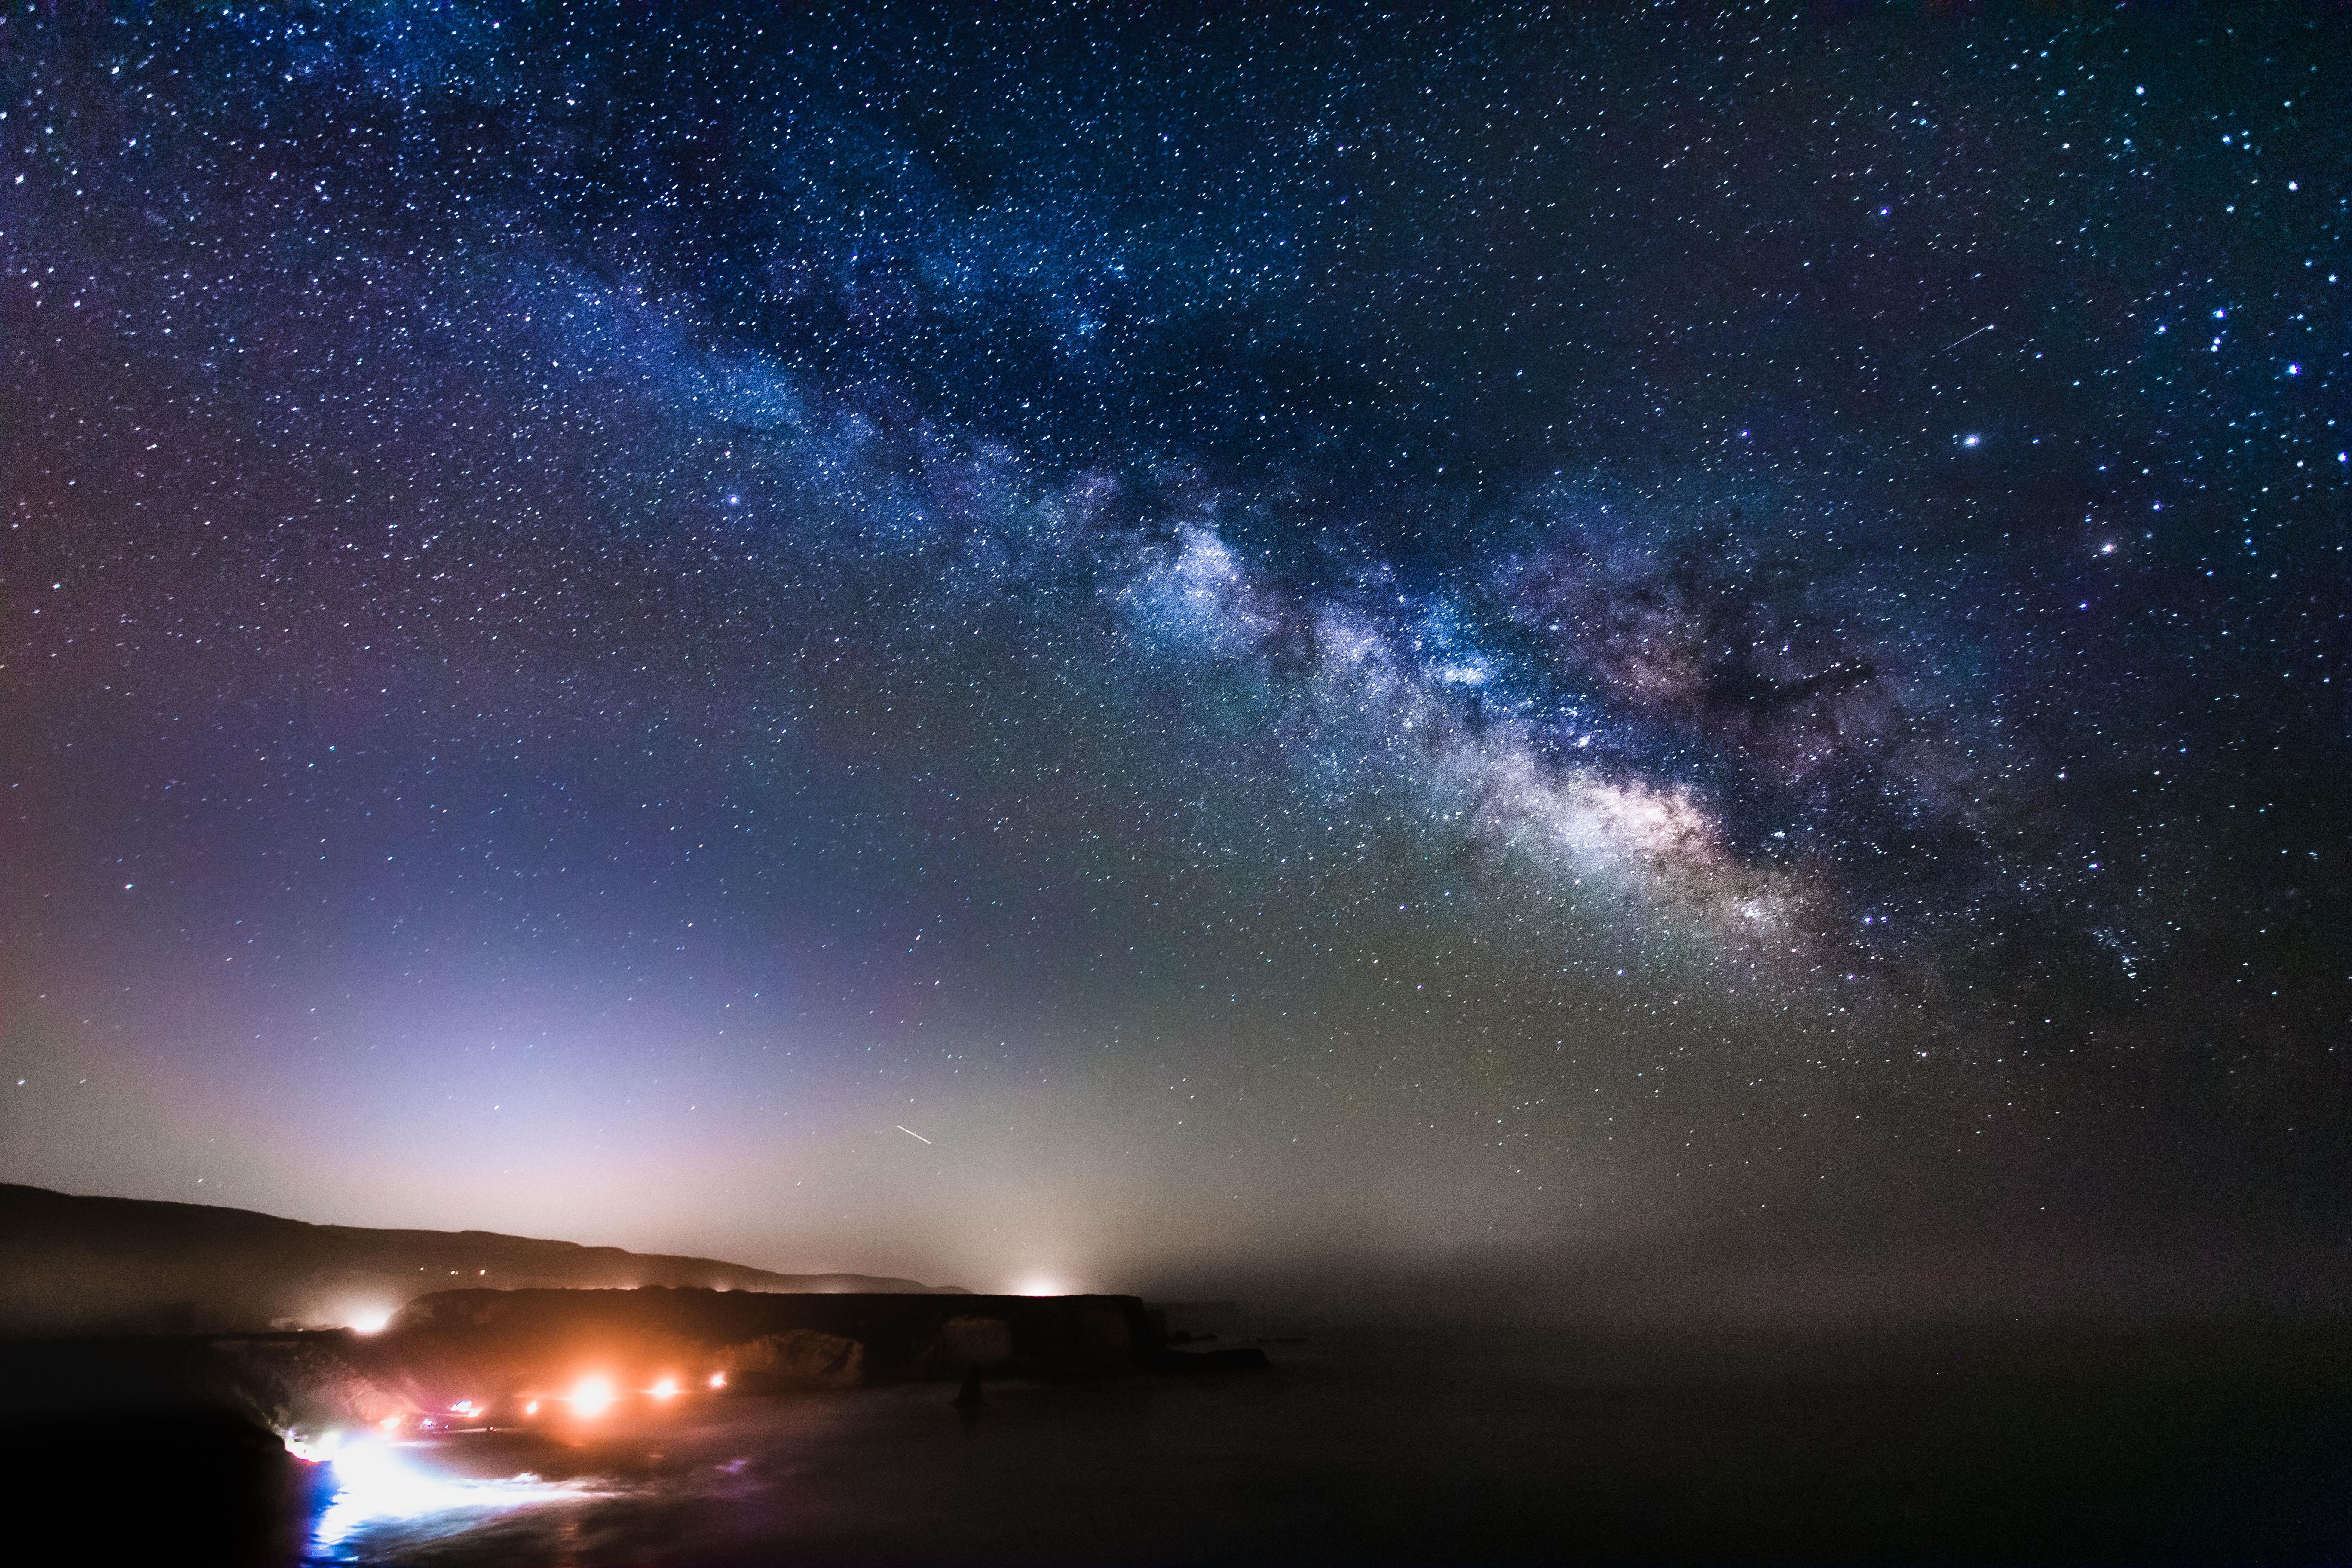 milky way galaxy - HD1600×1066